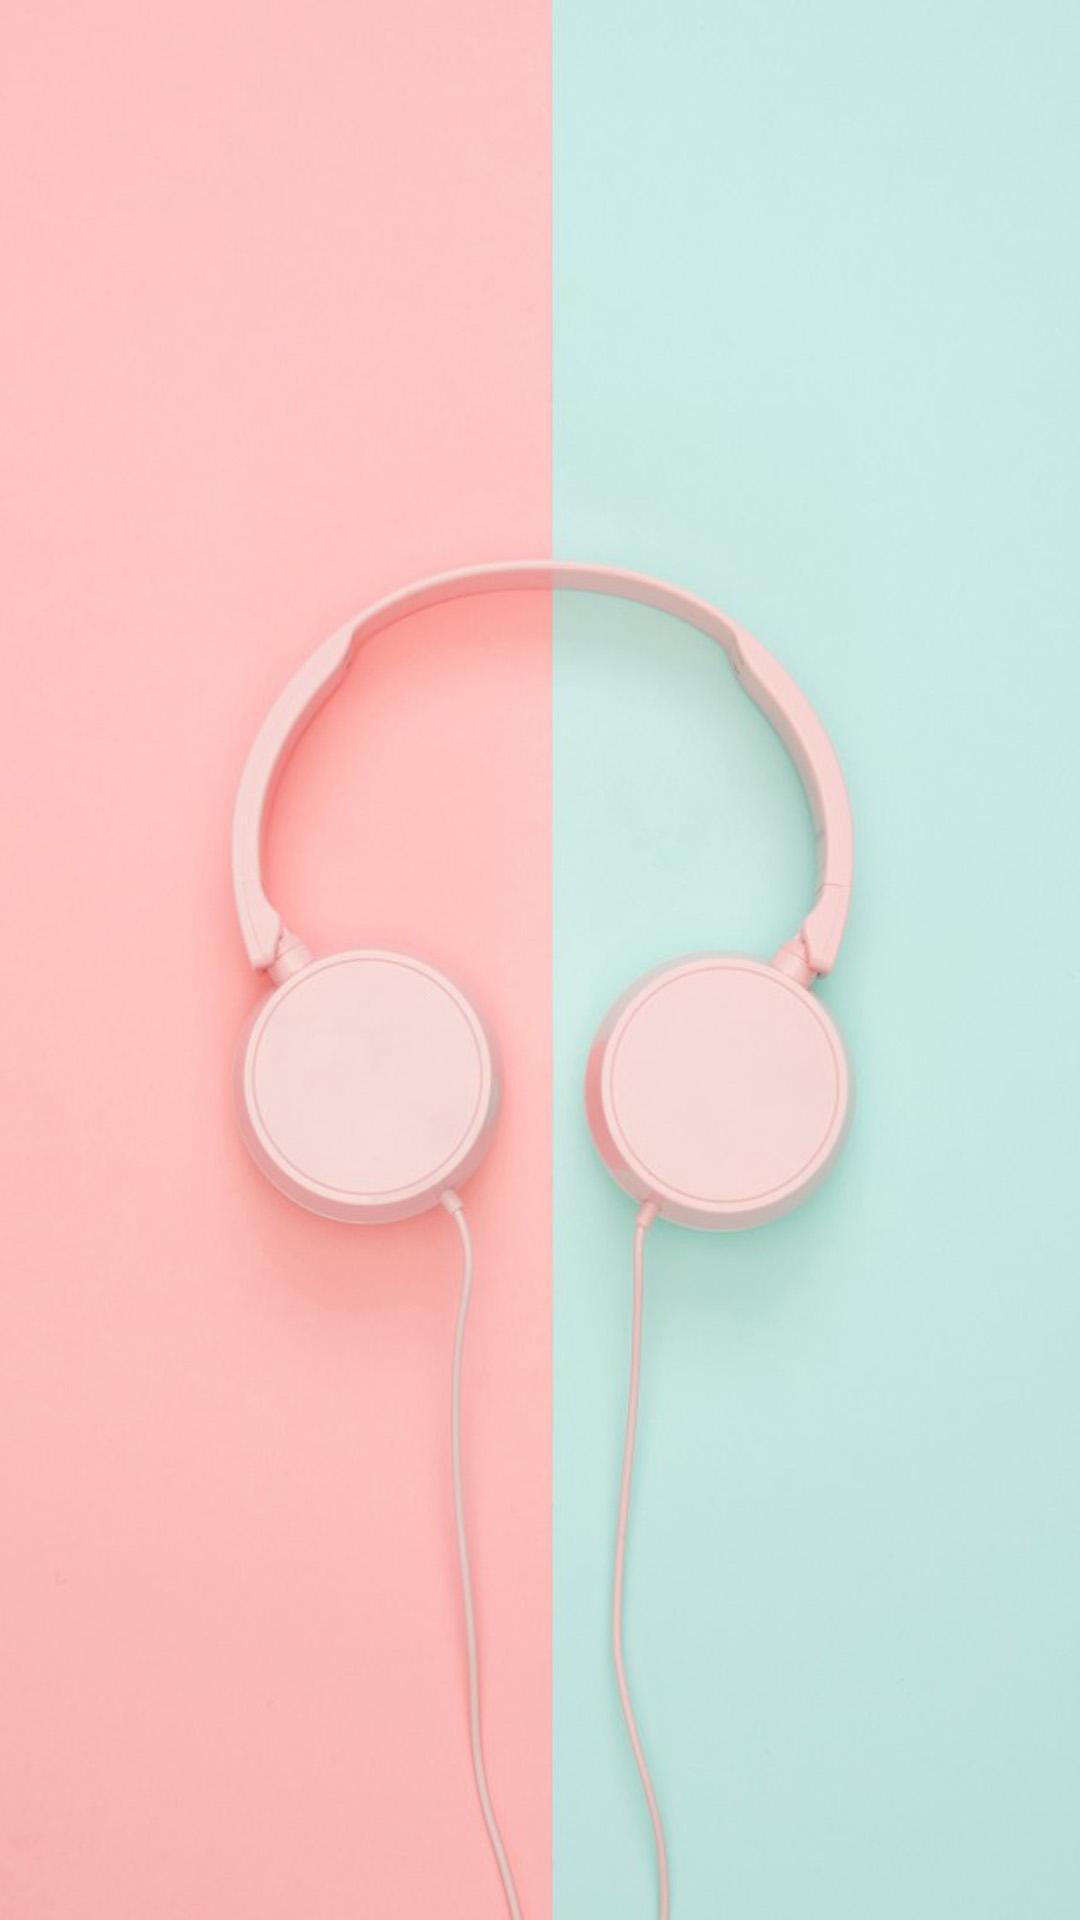 Pink Teal Headphones Free 4k Ultra Hd Mobile Wallpaper